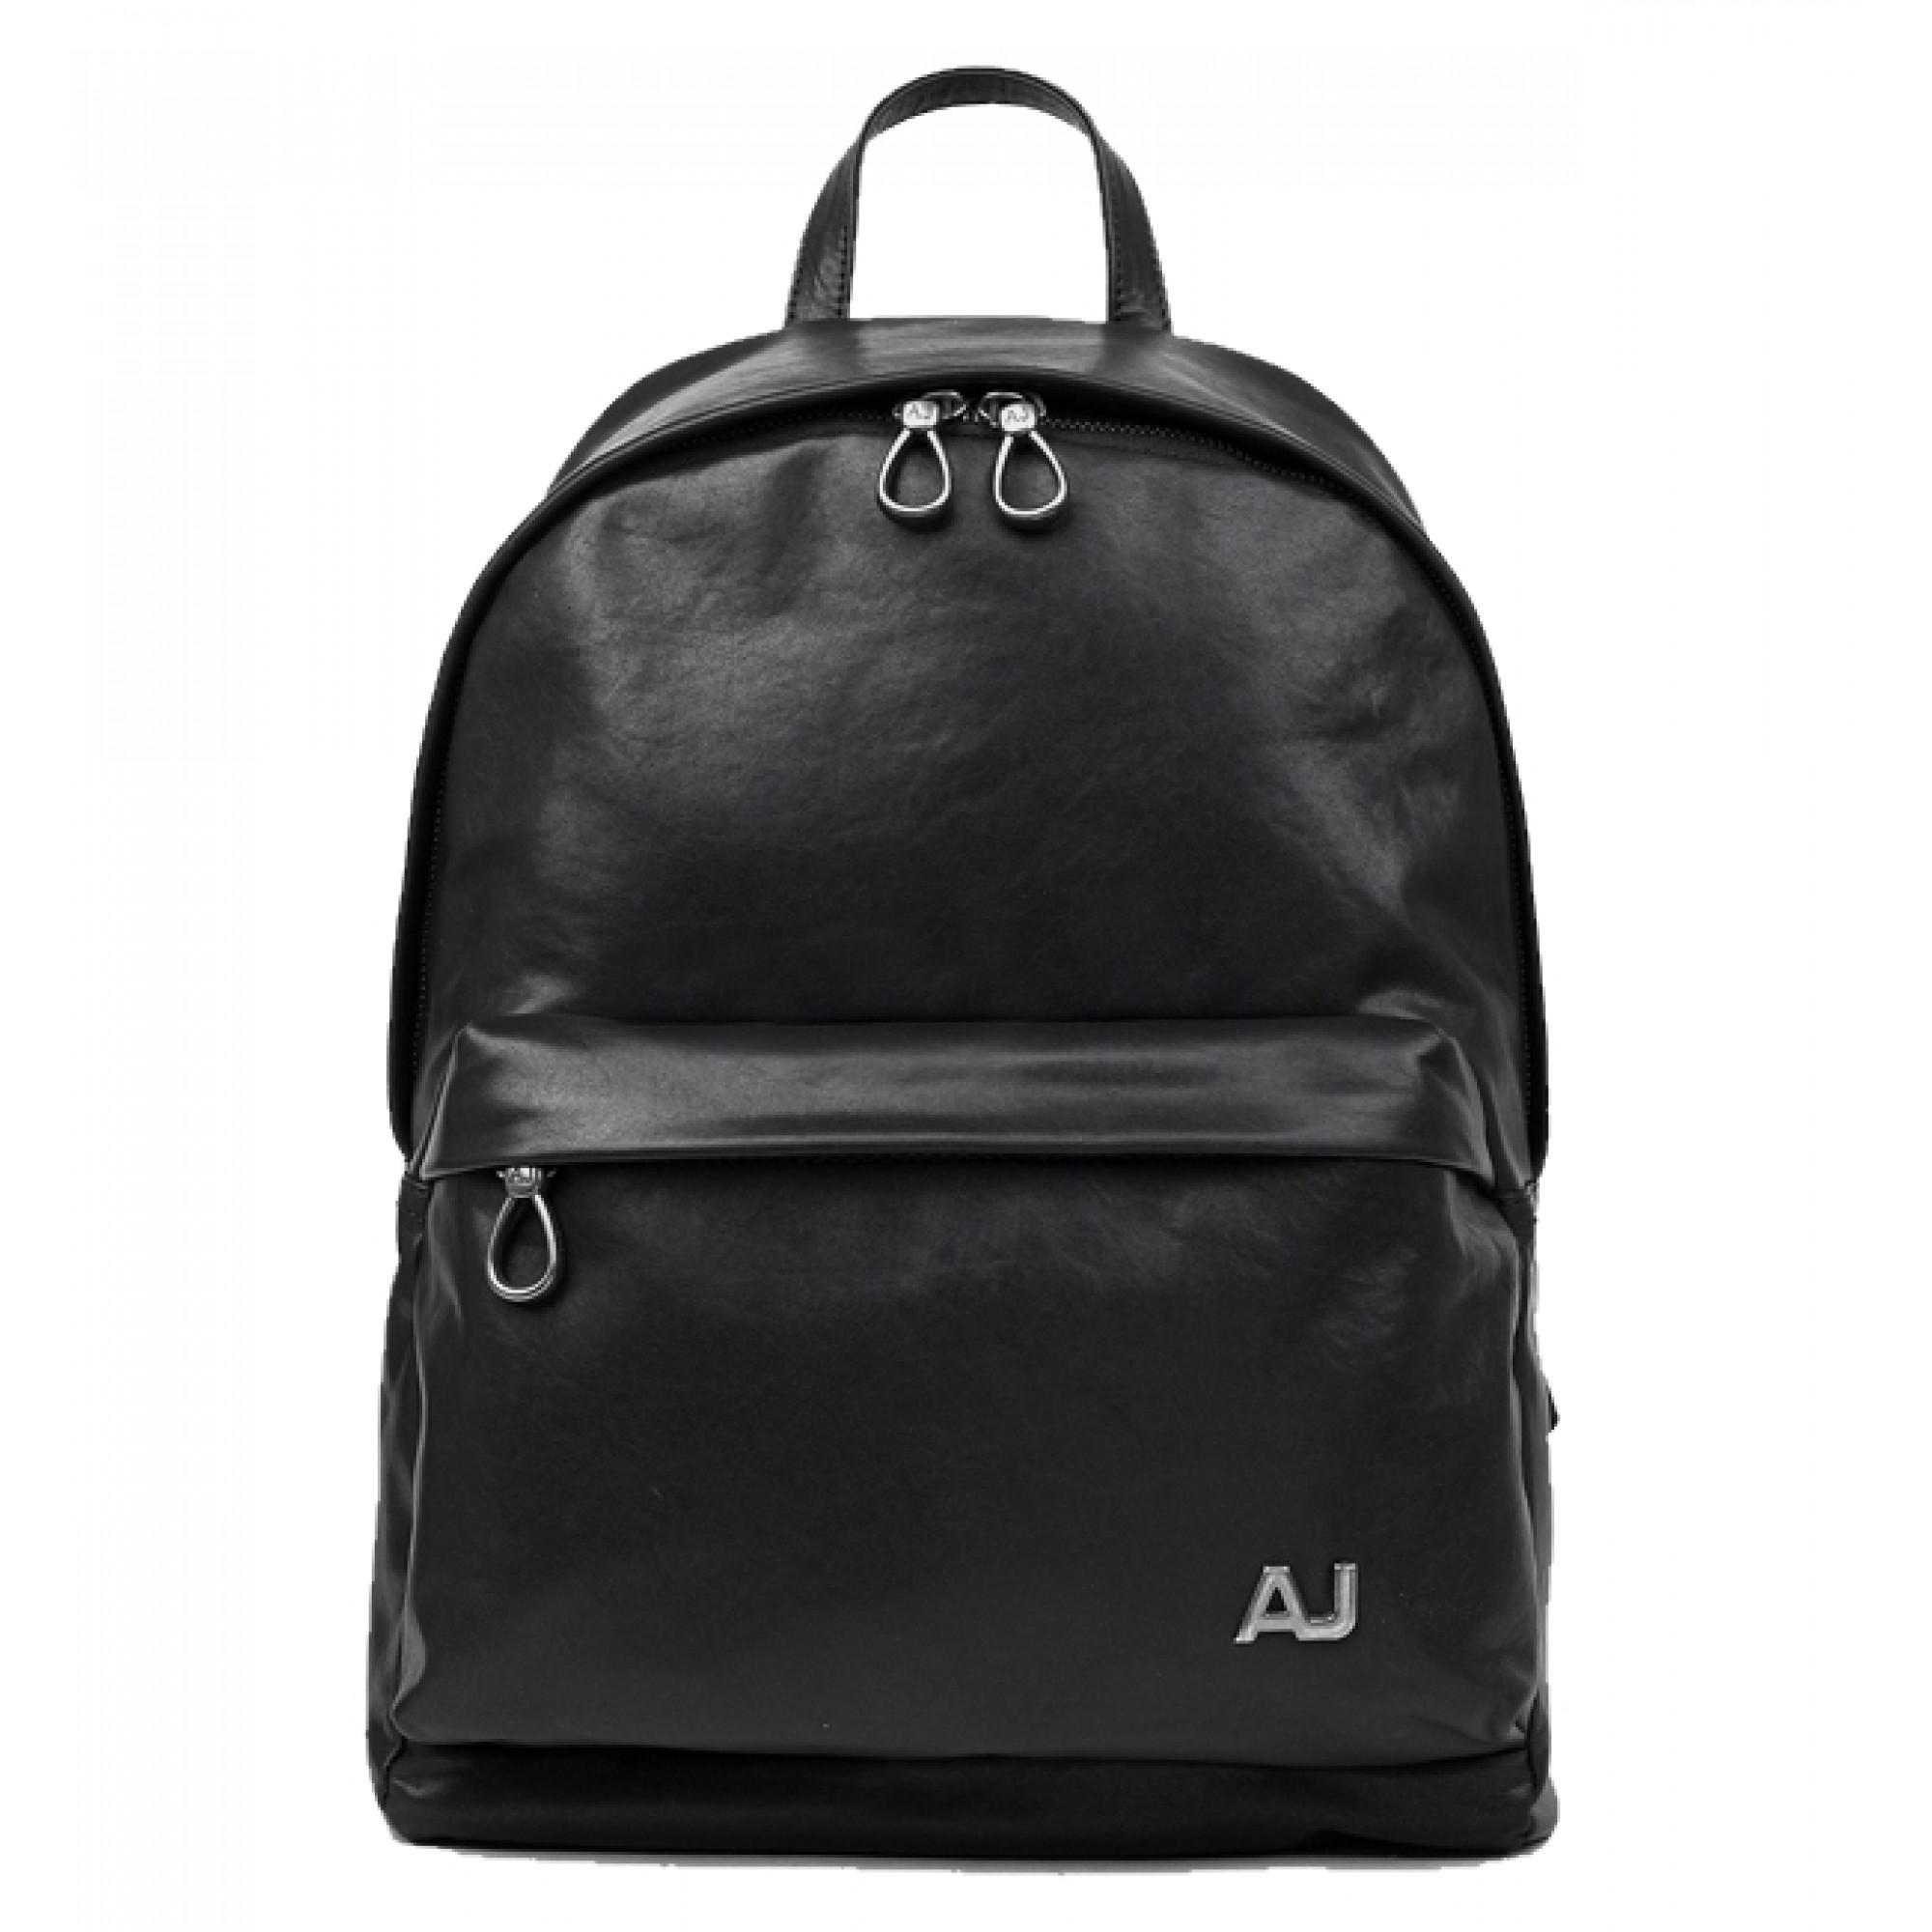 Черный рюкзак от Armani Jeans  купить мужские сумки в интернет ... d7d41a213a6